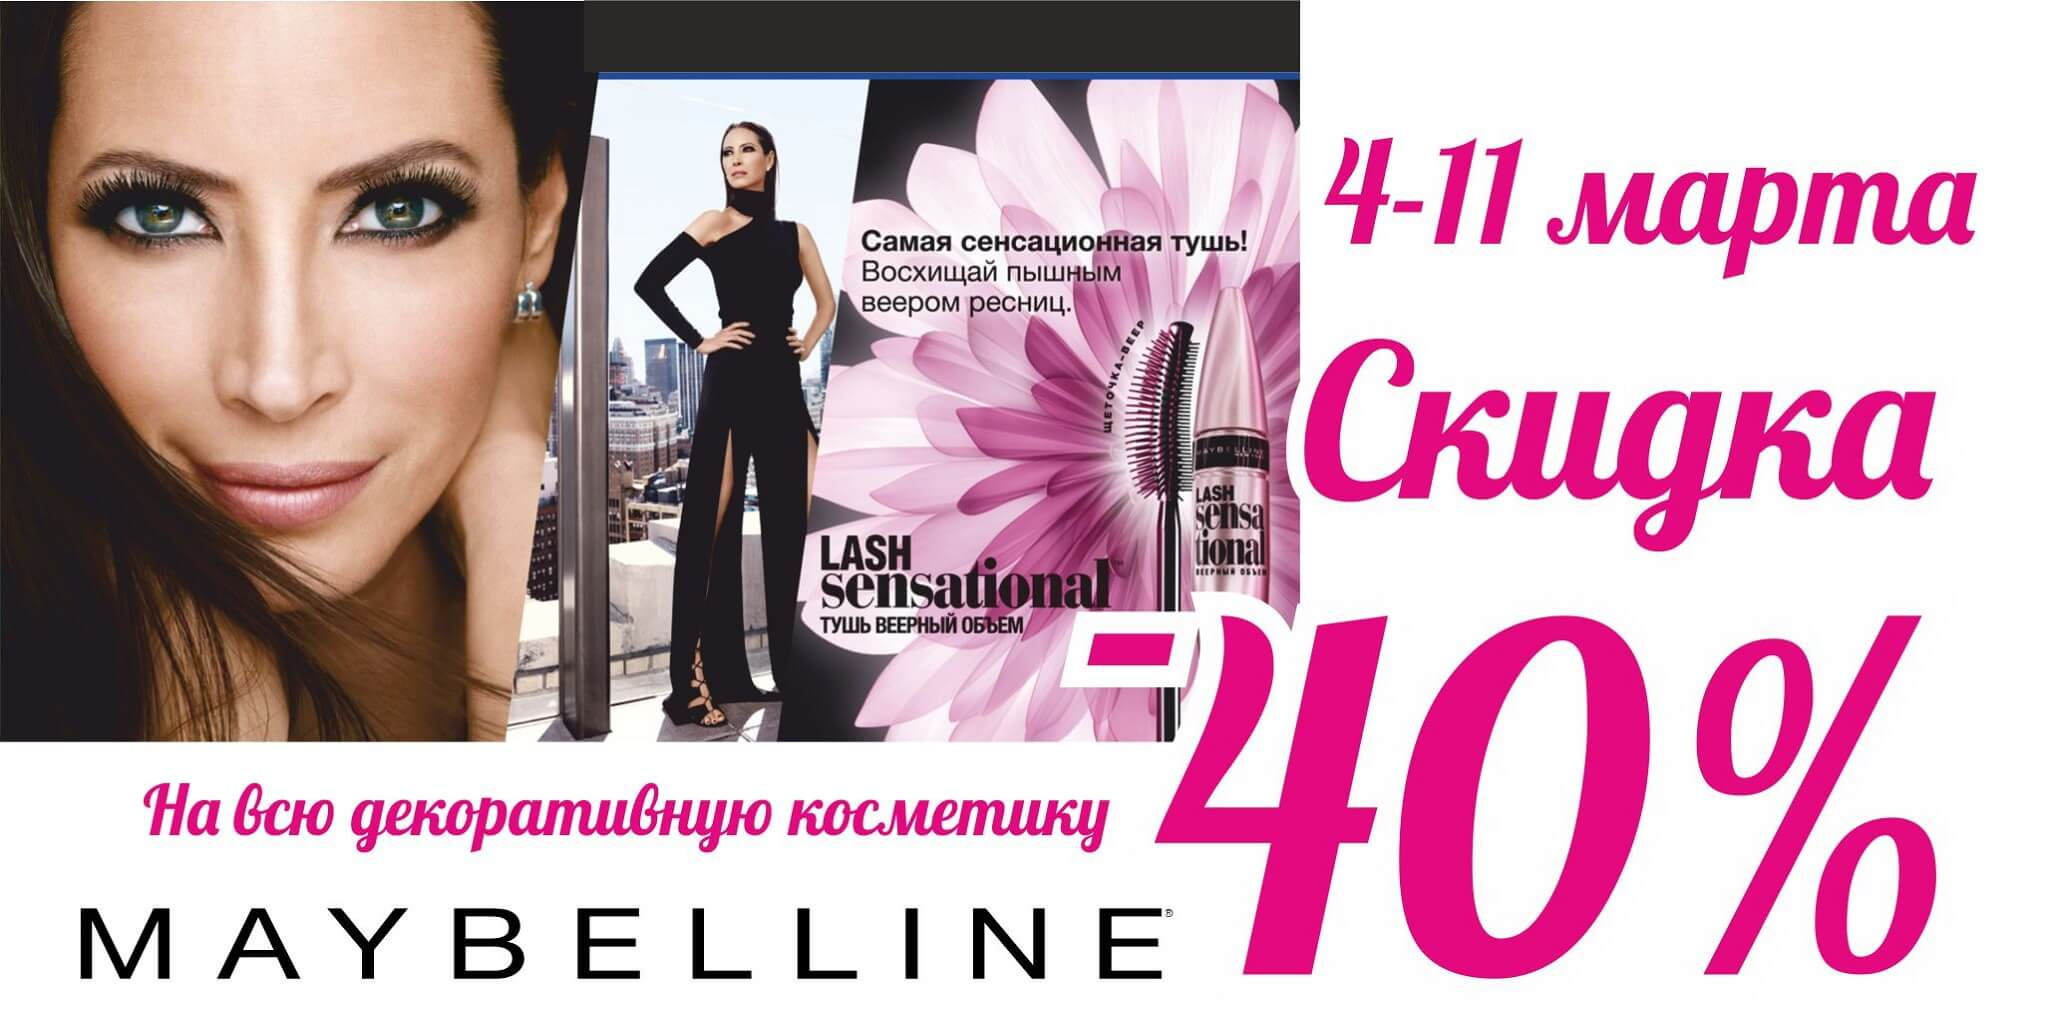 skidka-40-na-dekorativnuyu-kosmetiku-ot-maybelline 37c206d9a945c